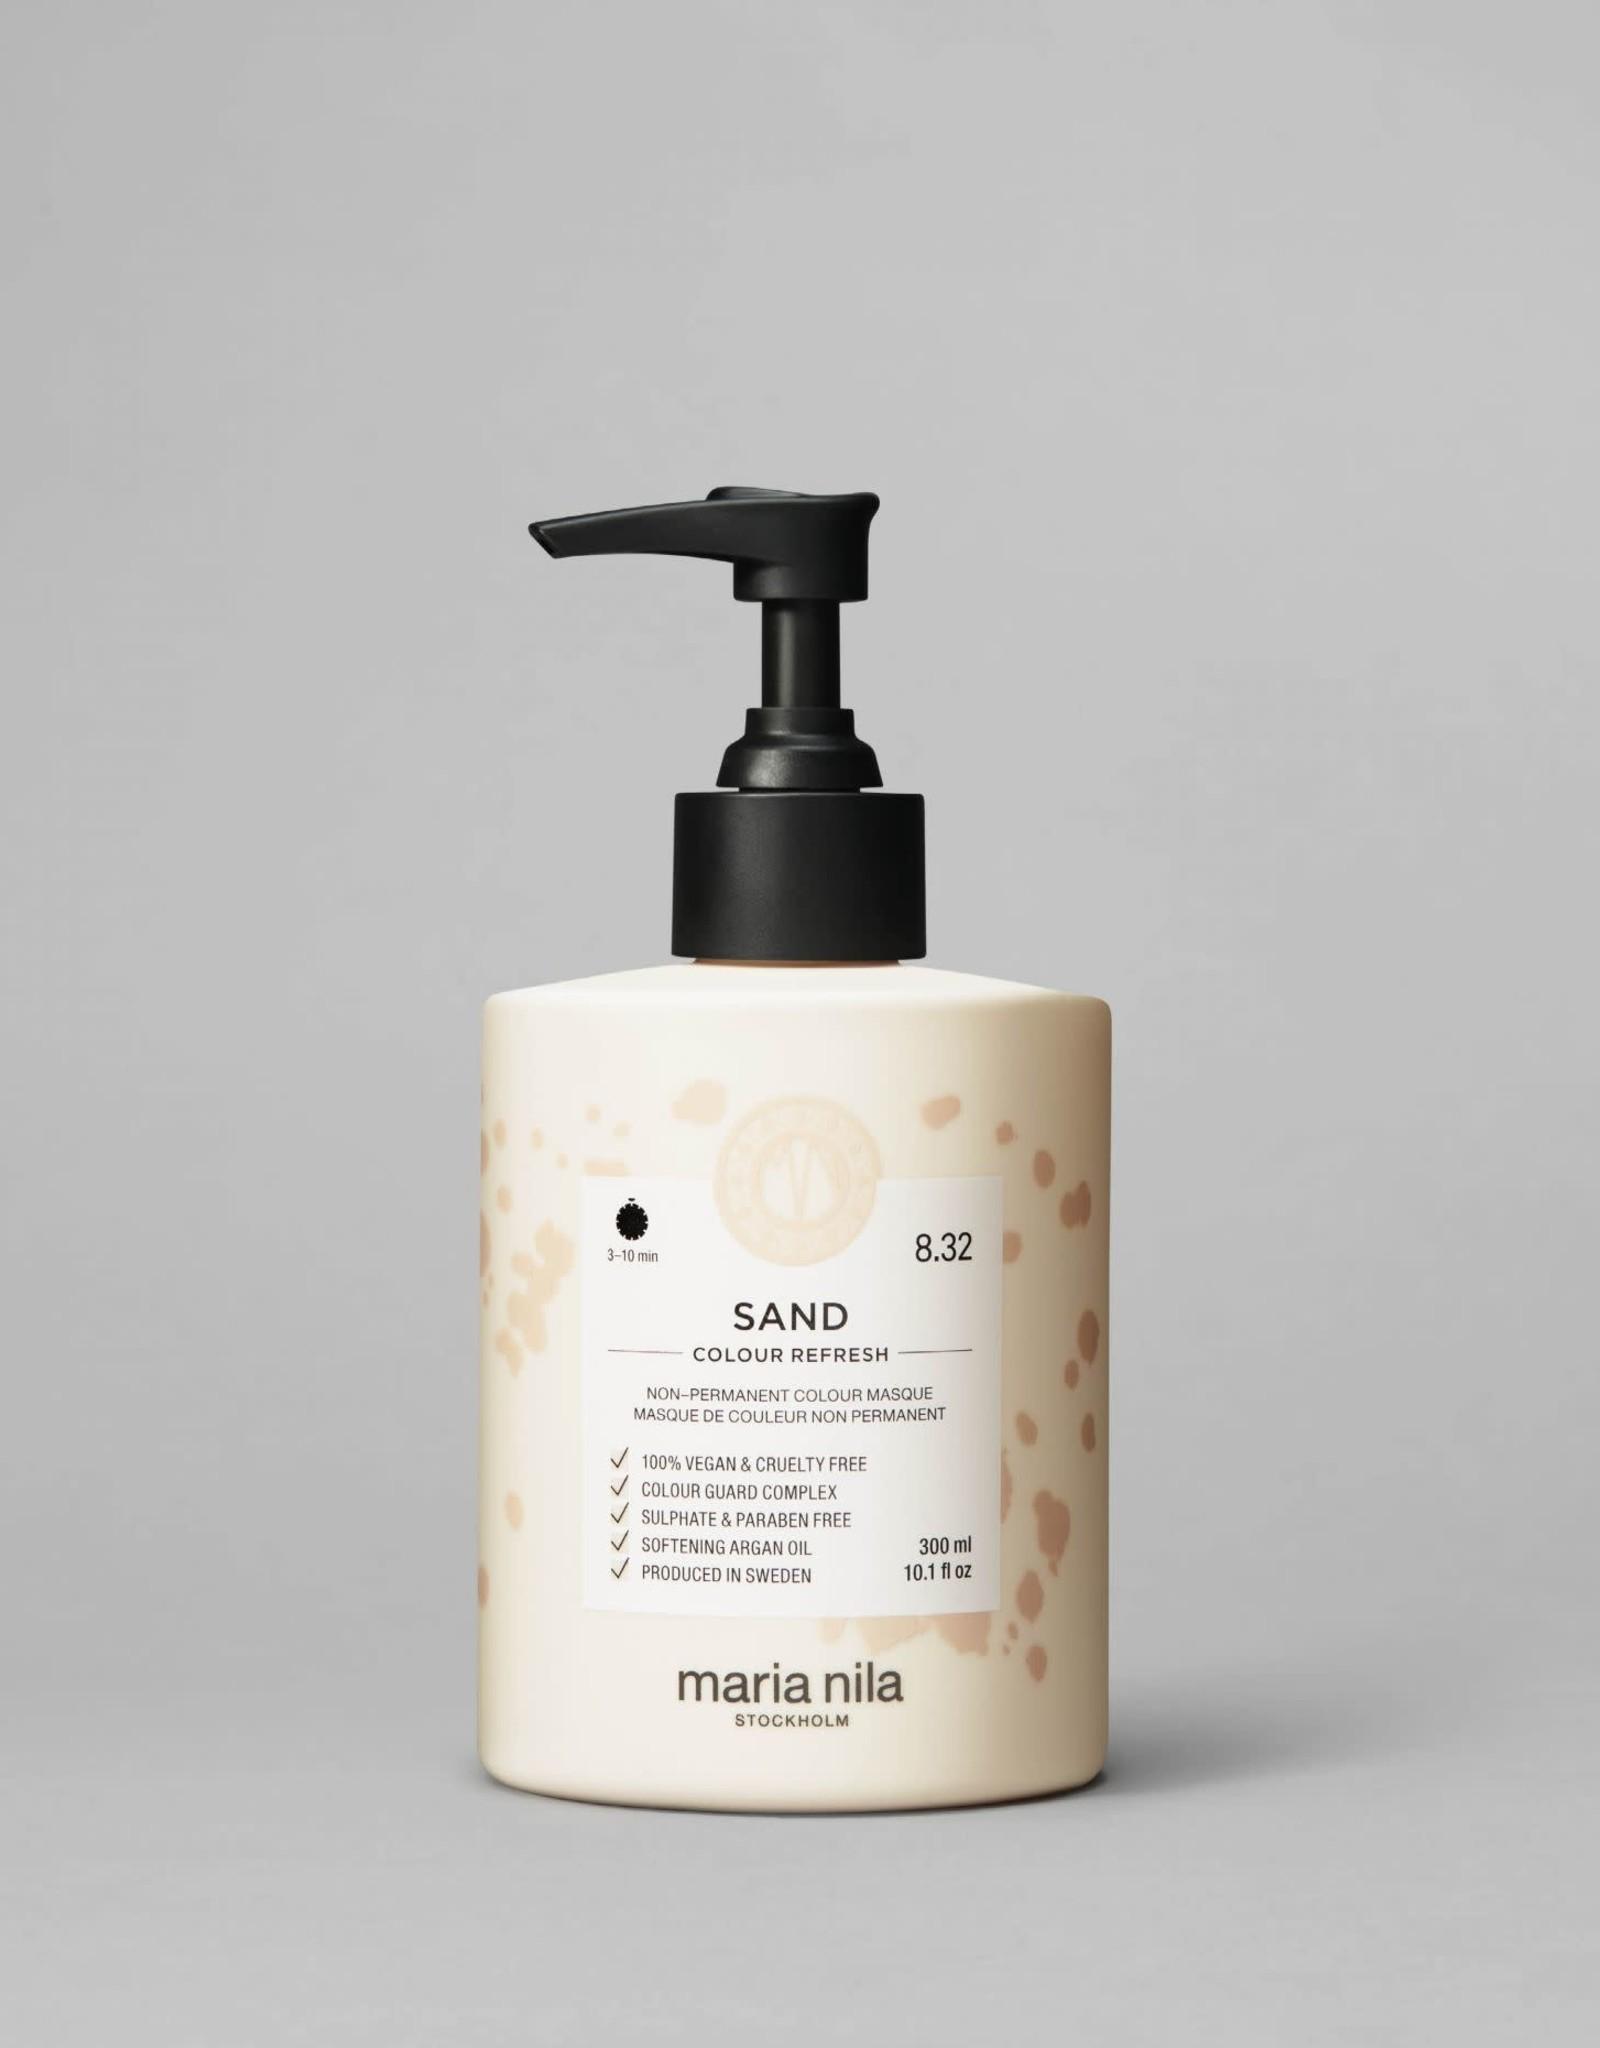 Maria Nila Colour Refresh Sand 300ml